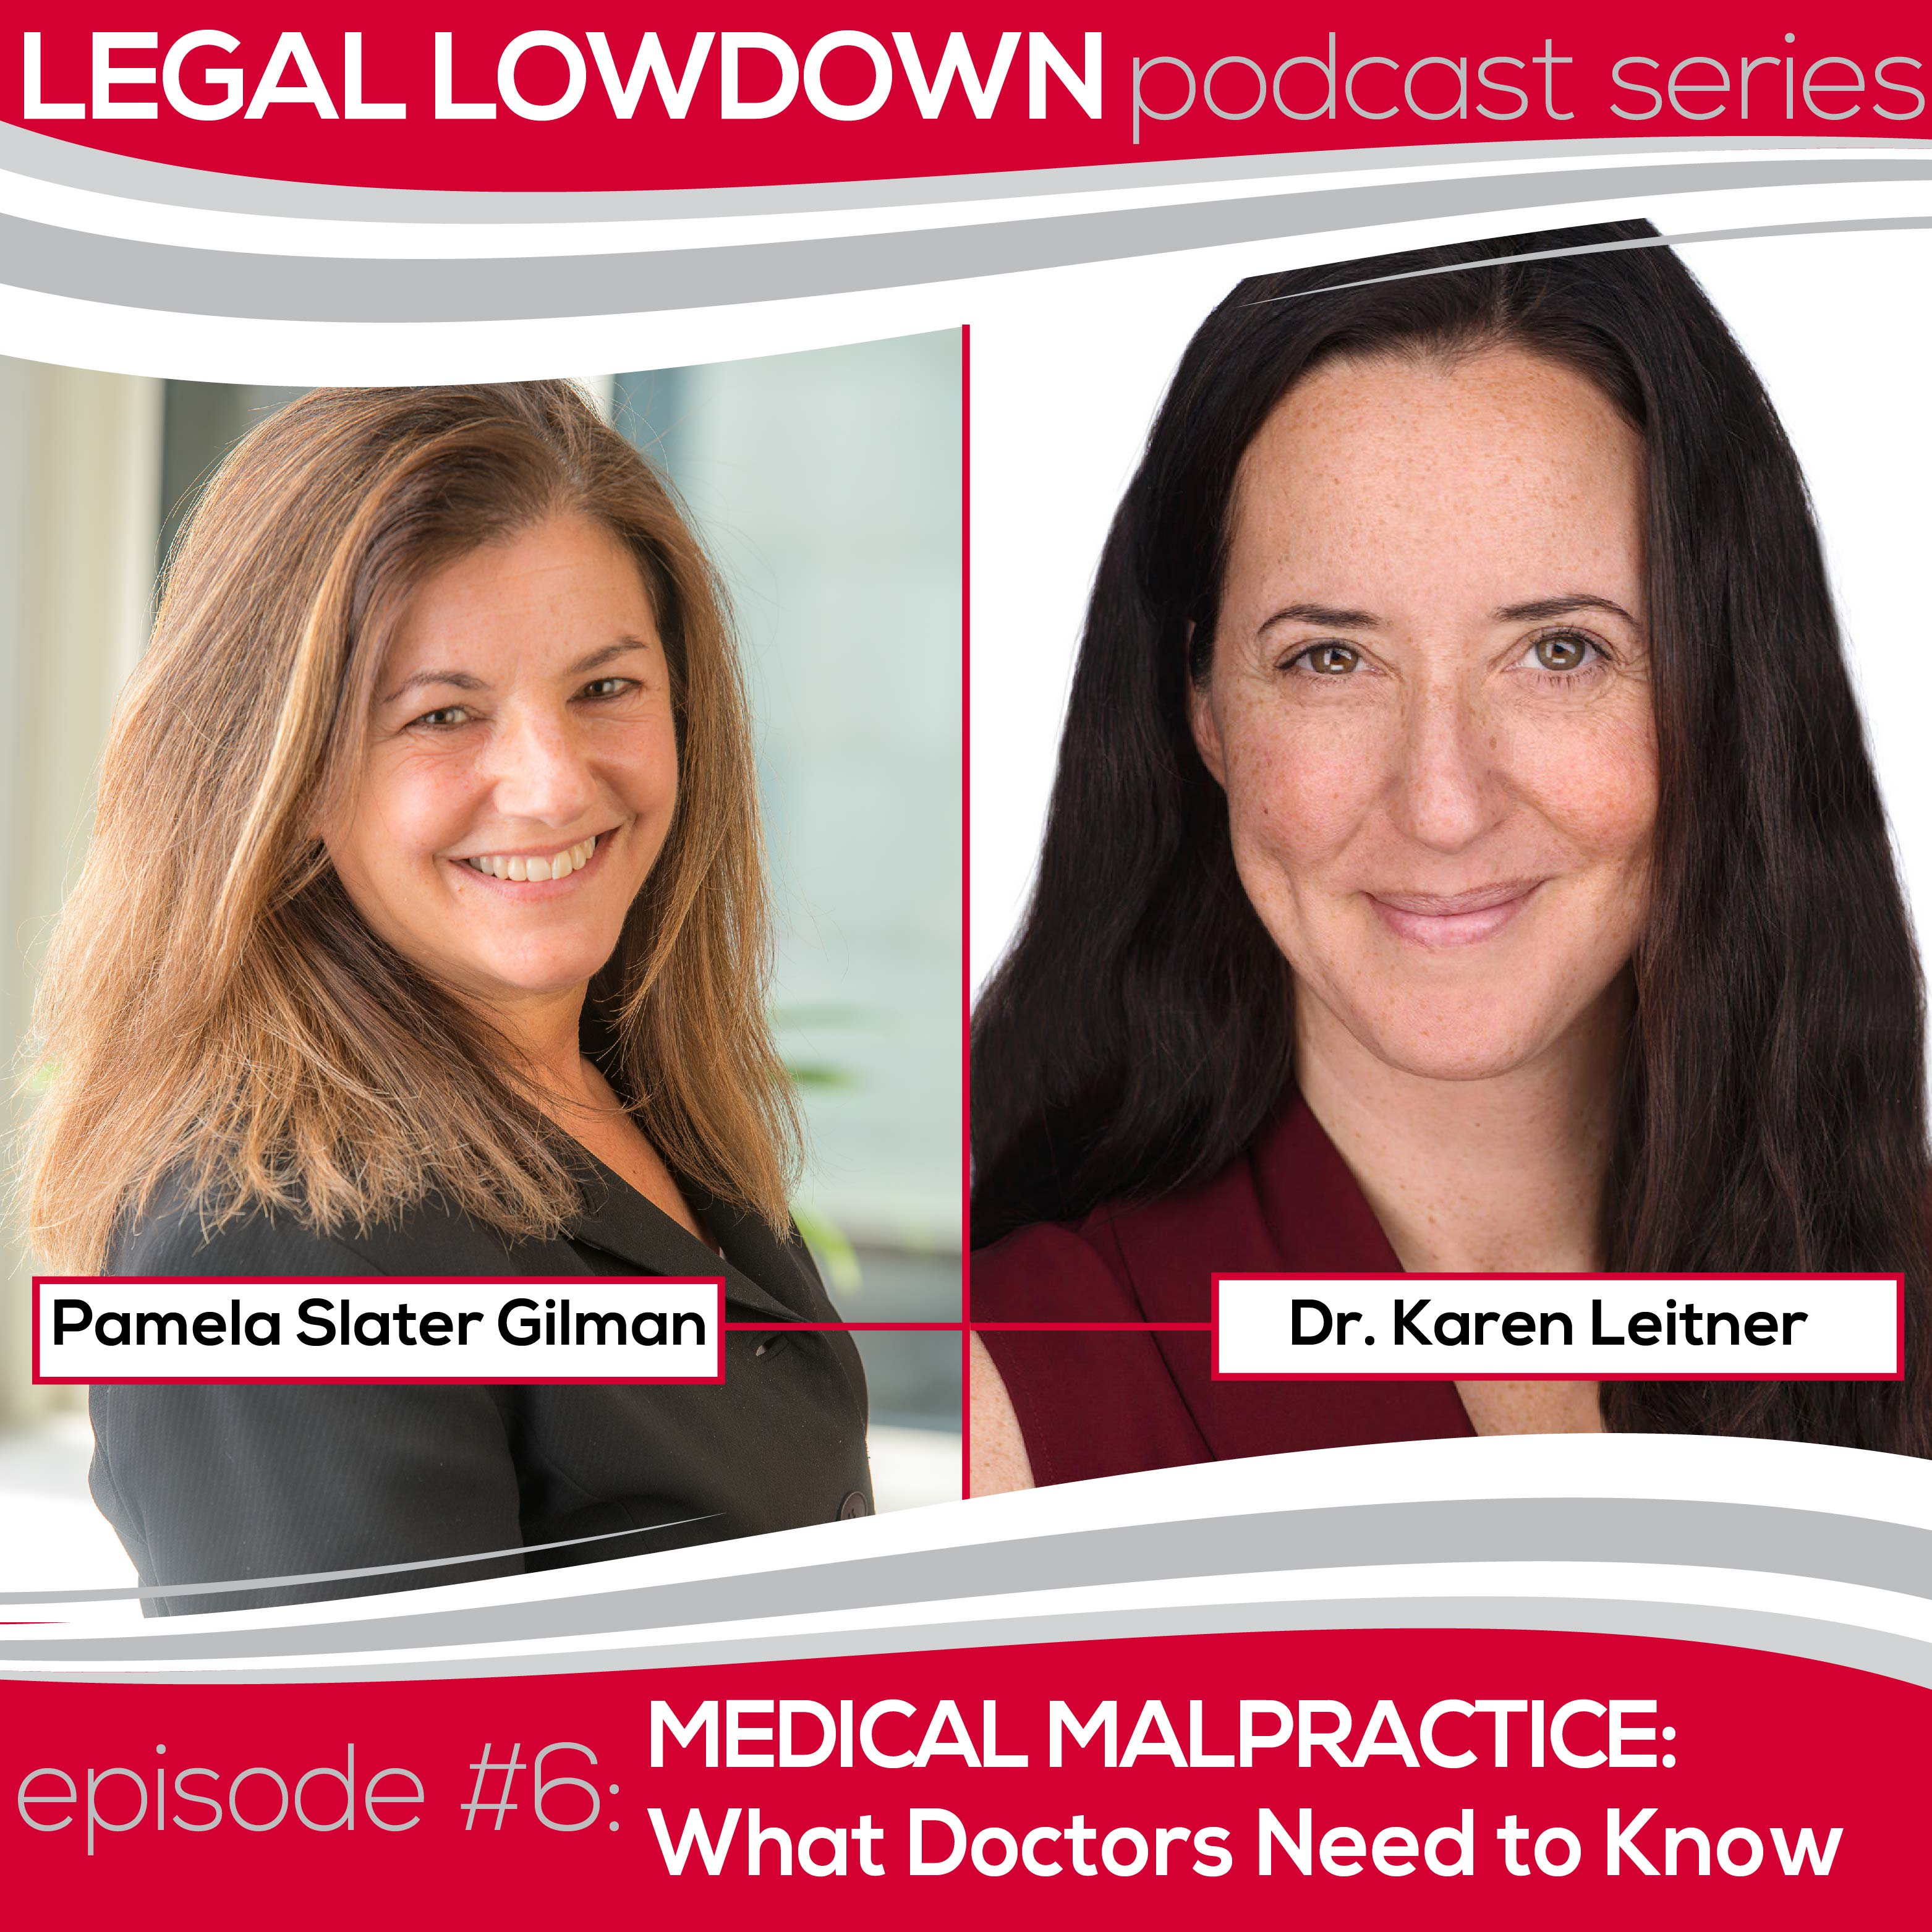 Medical Malpractice Law